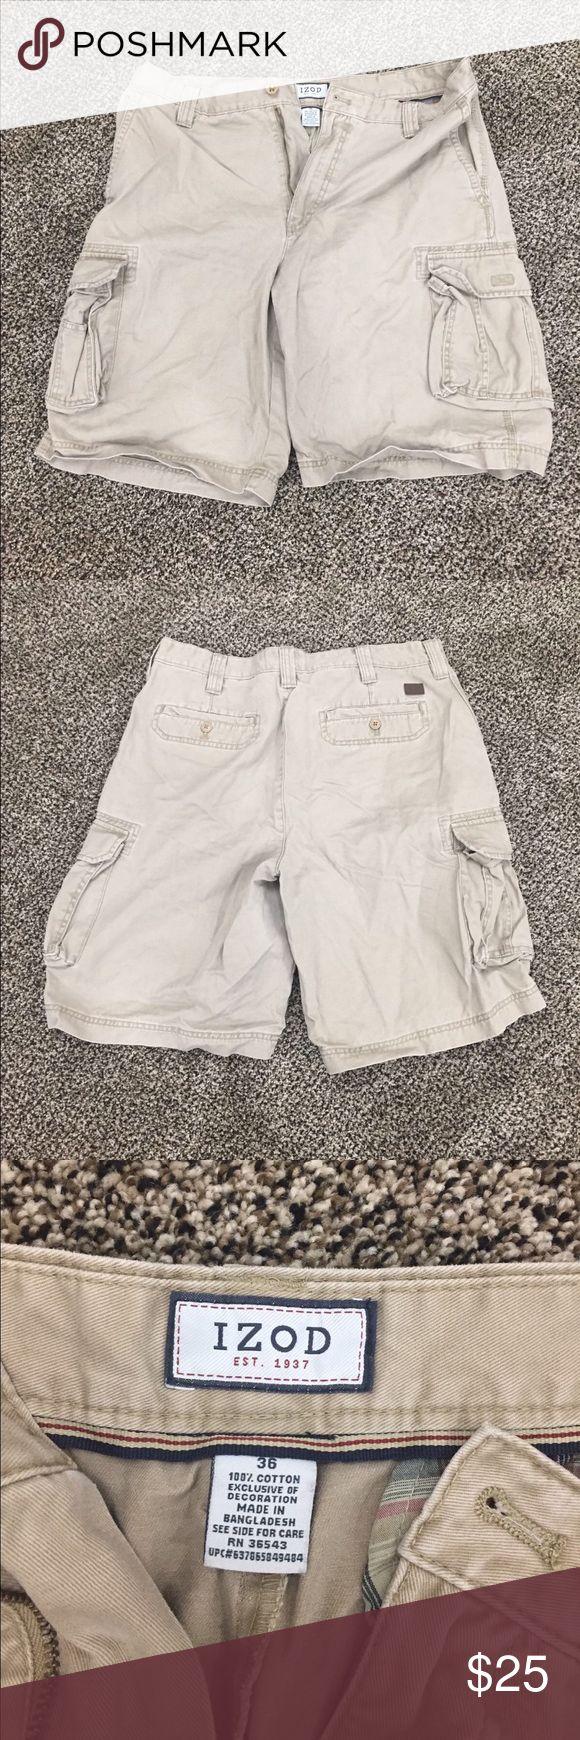 Izod Kakhi Men's Dress Shorts 100% Cotton  Men's Dress Shorts  Khaki shorts  36  Perfect Condition  Worn Once Izod Shorts Cargo